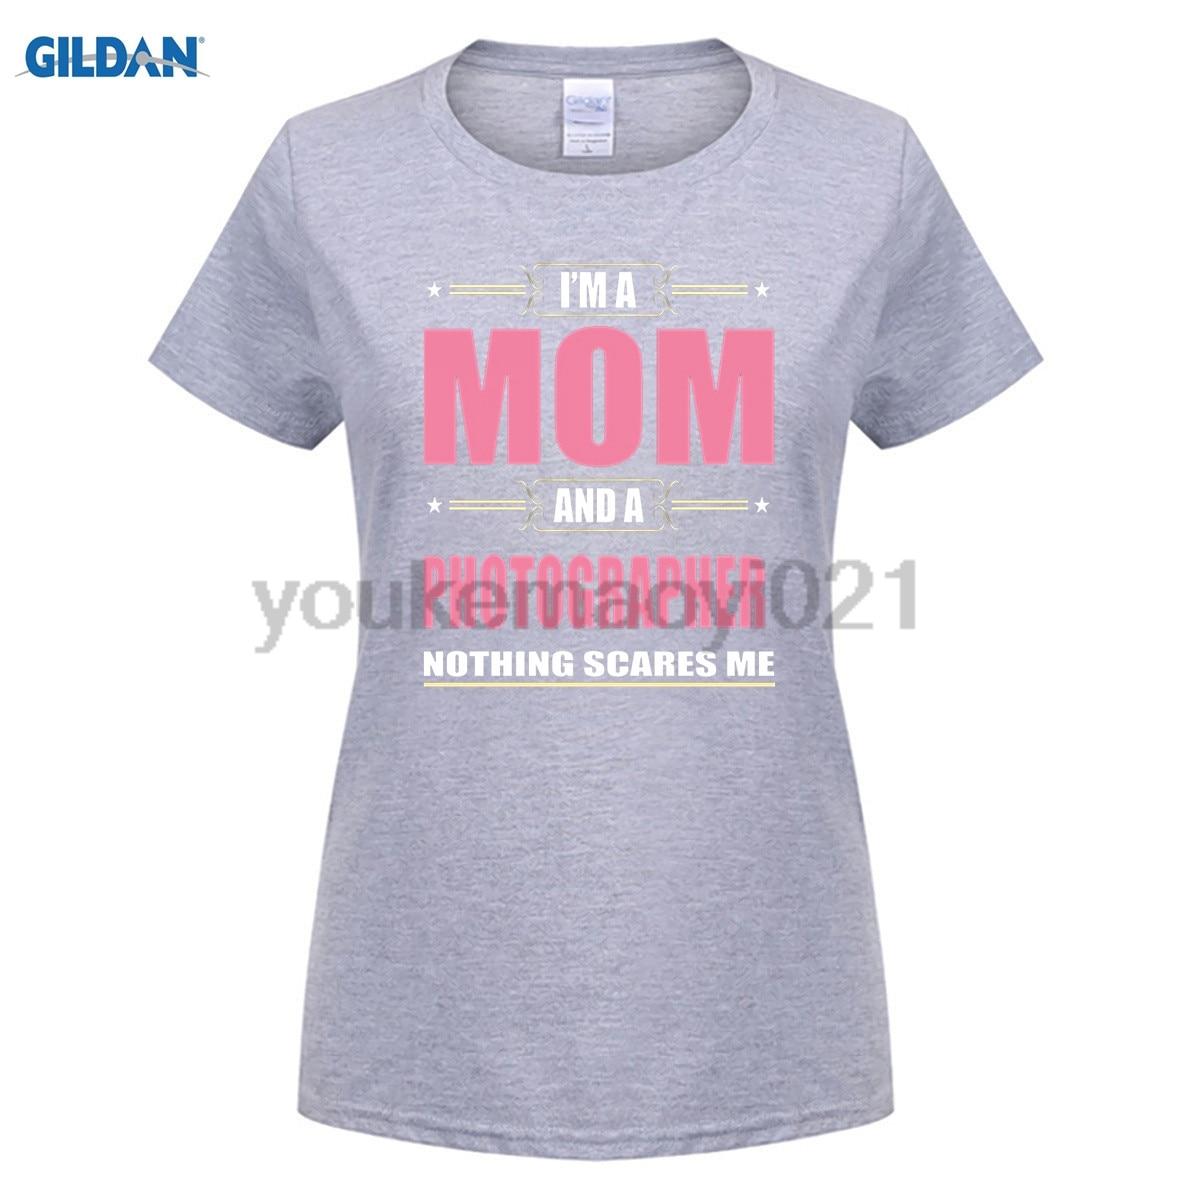 GILDAN Photographer MOM T shirt Christmas Gifts For Mom for women